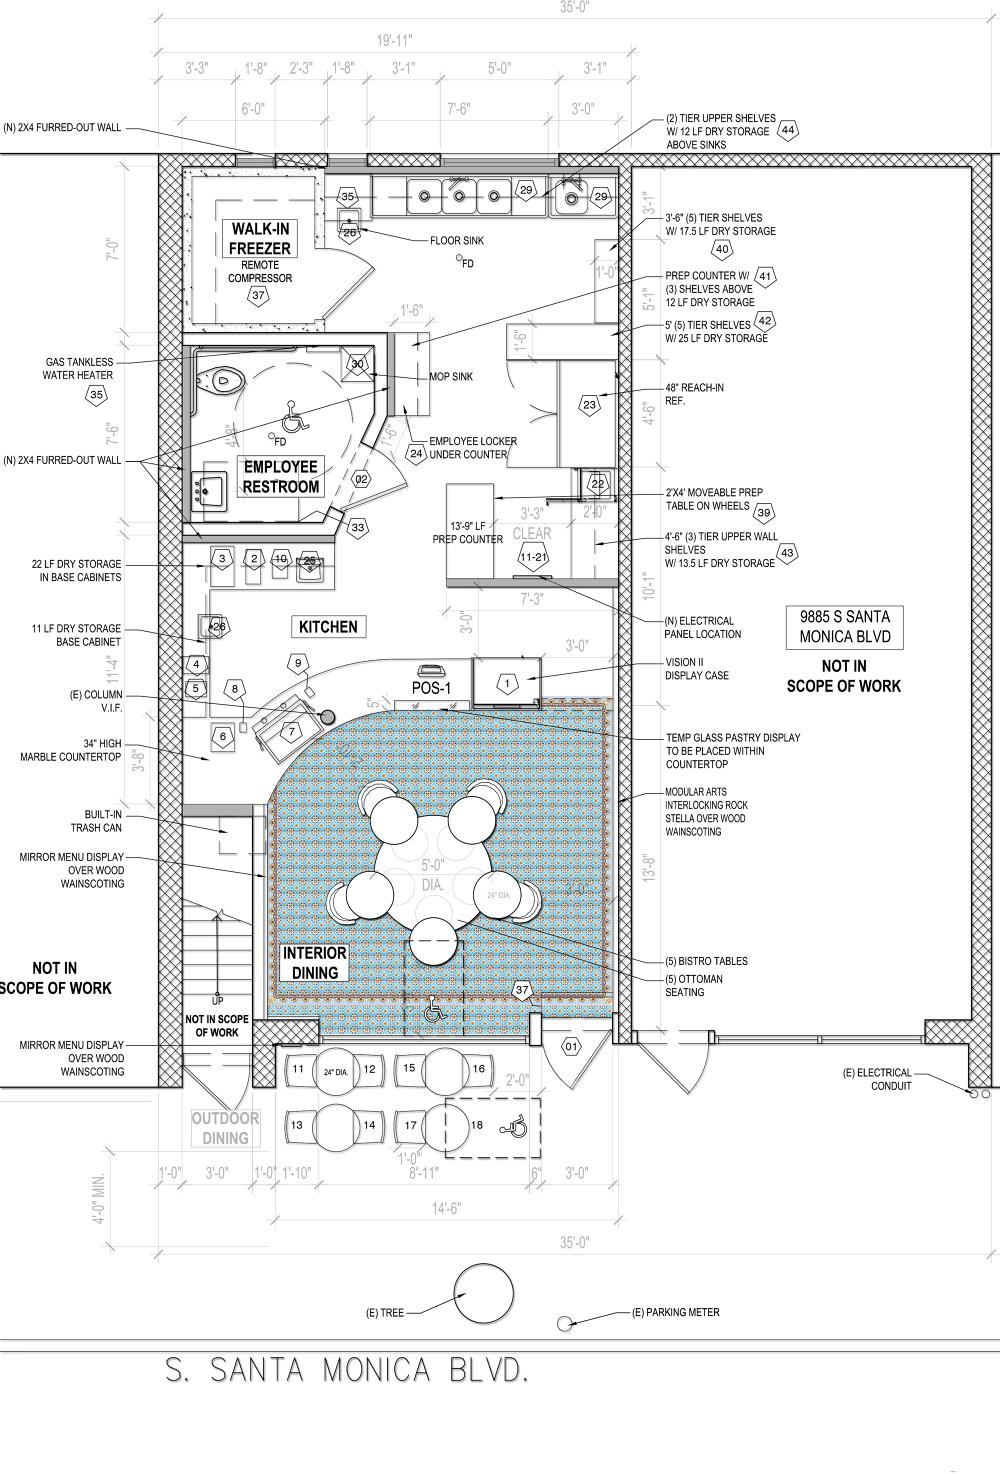 Merci clement mass architecture design previous next image 1 of 15 thumbnails ccuart Choice Image